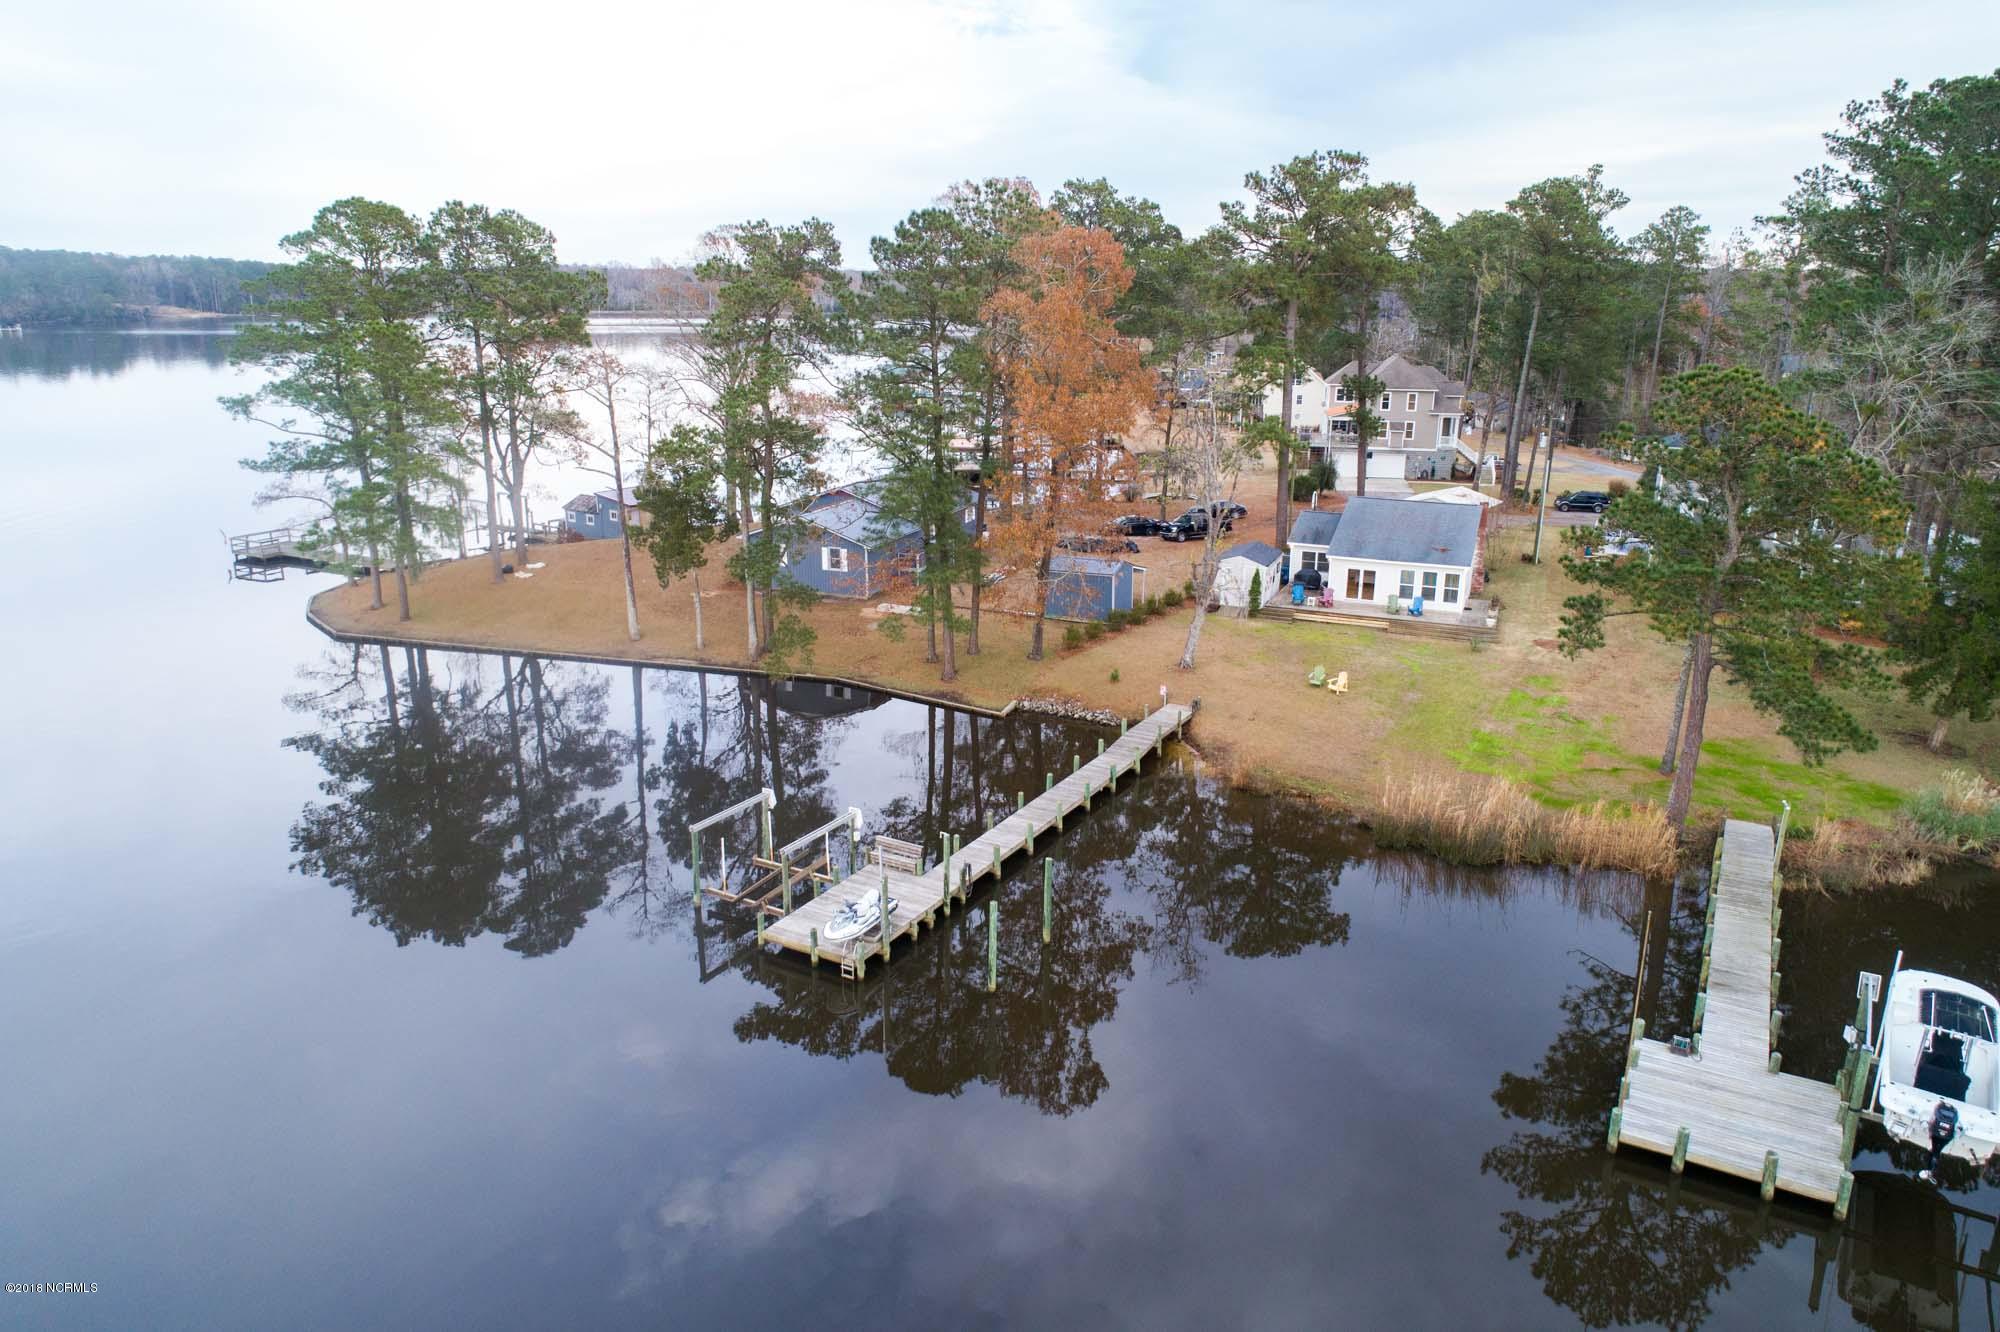 112 Dickinson Road, Chocowinity, North Carolina, 2 Bedrooms Bedrooms, 6 Rooms Rooms,2 BathroomsBathrooms,Single family residence,For sale,Dickinson,100143312